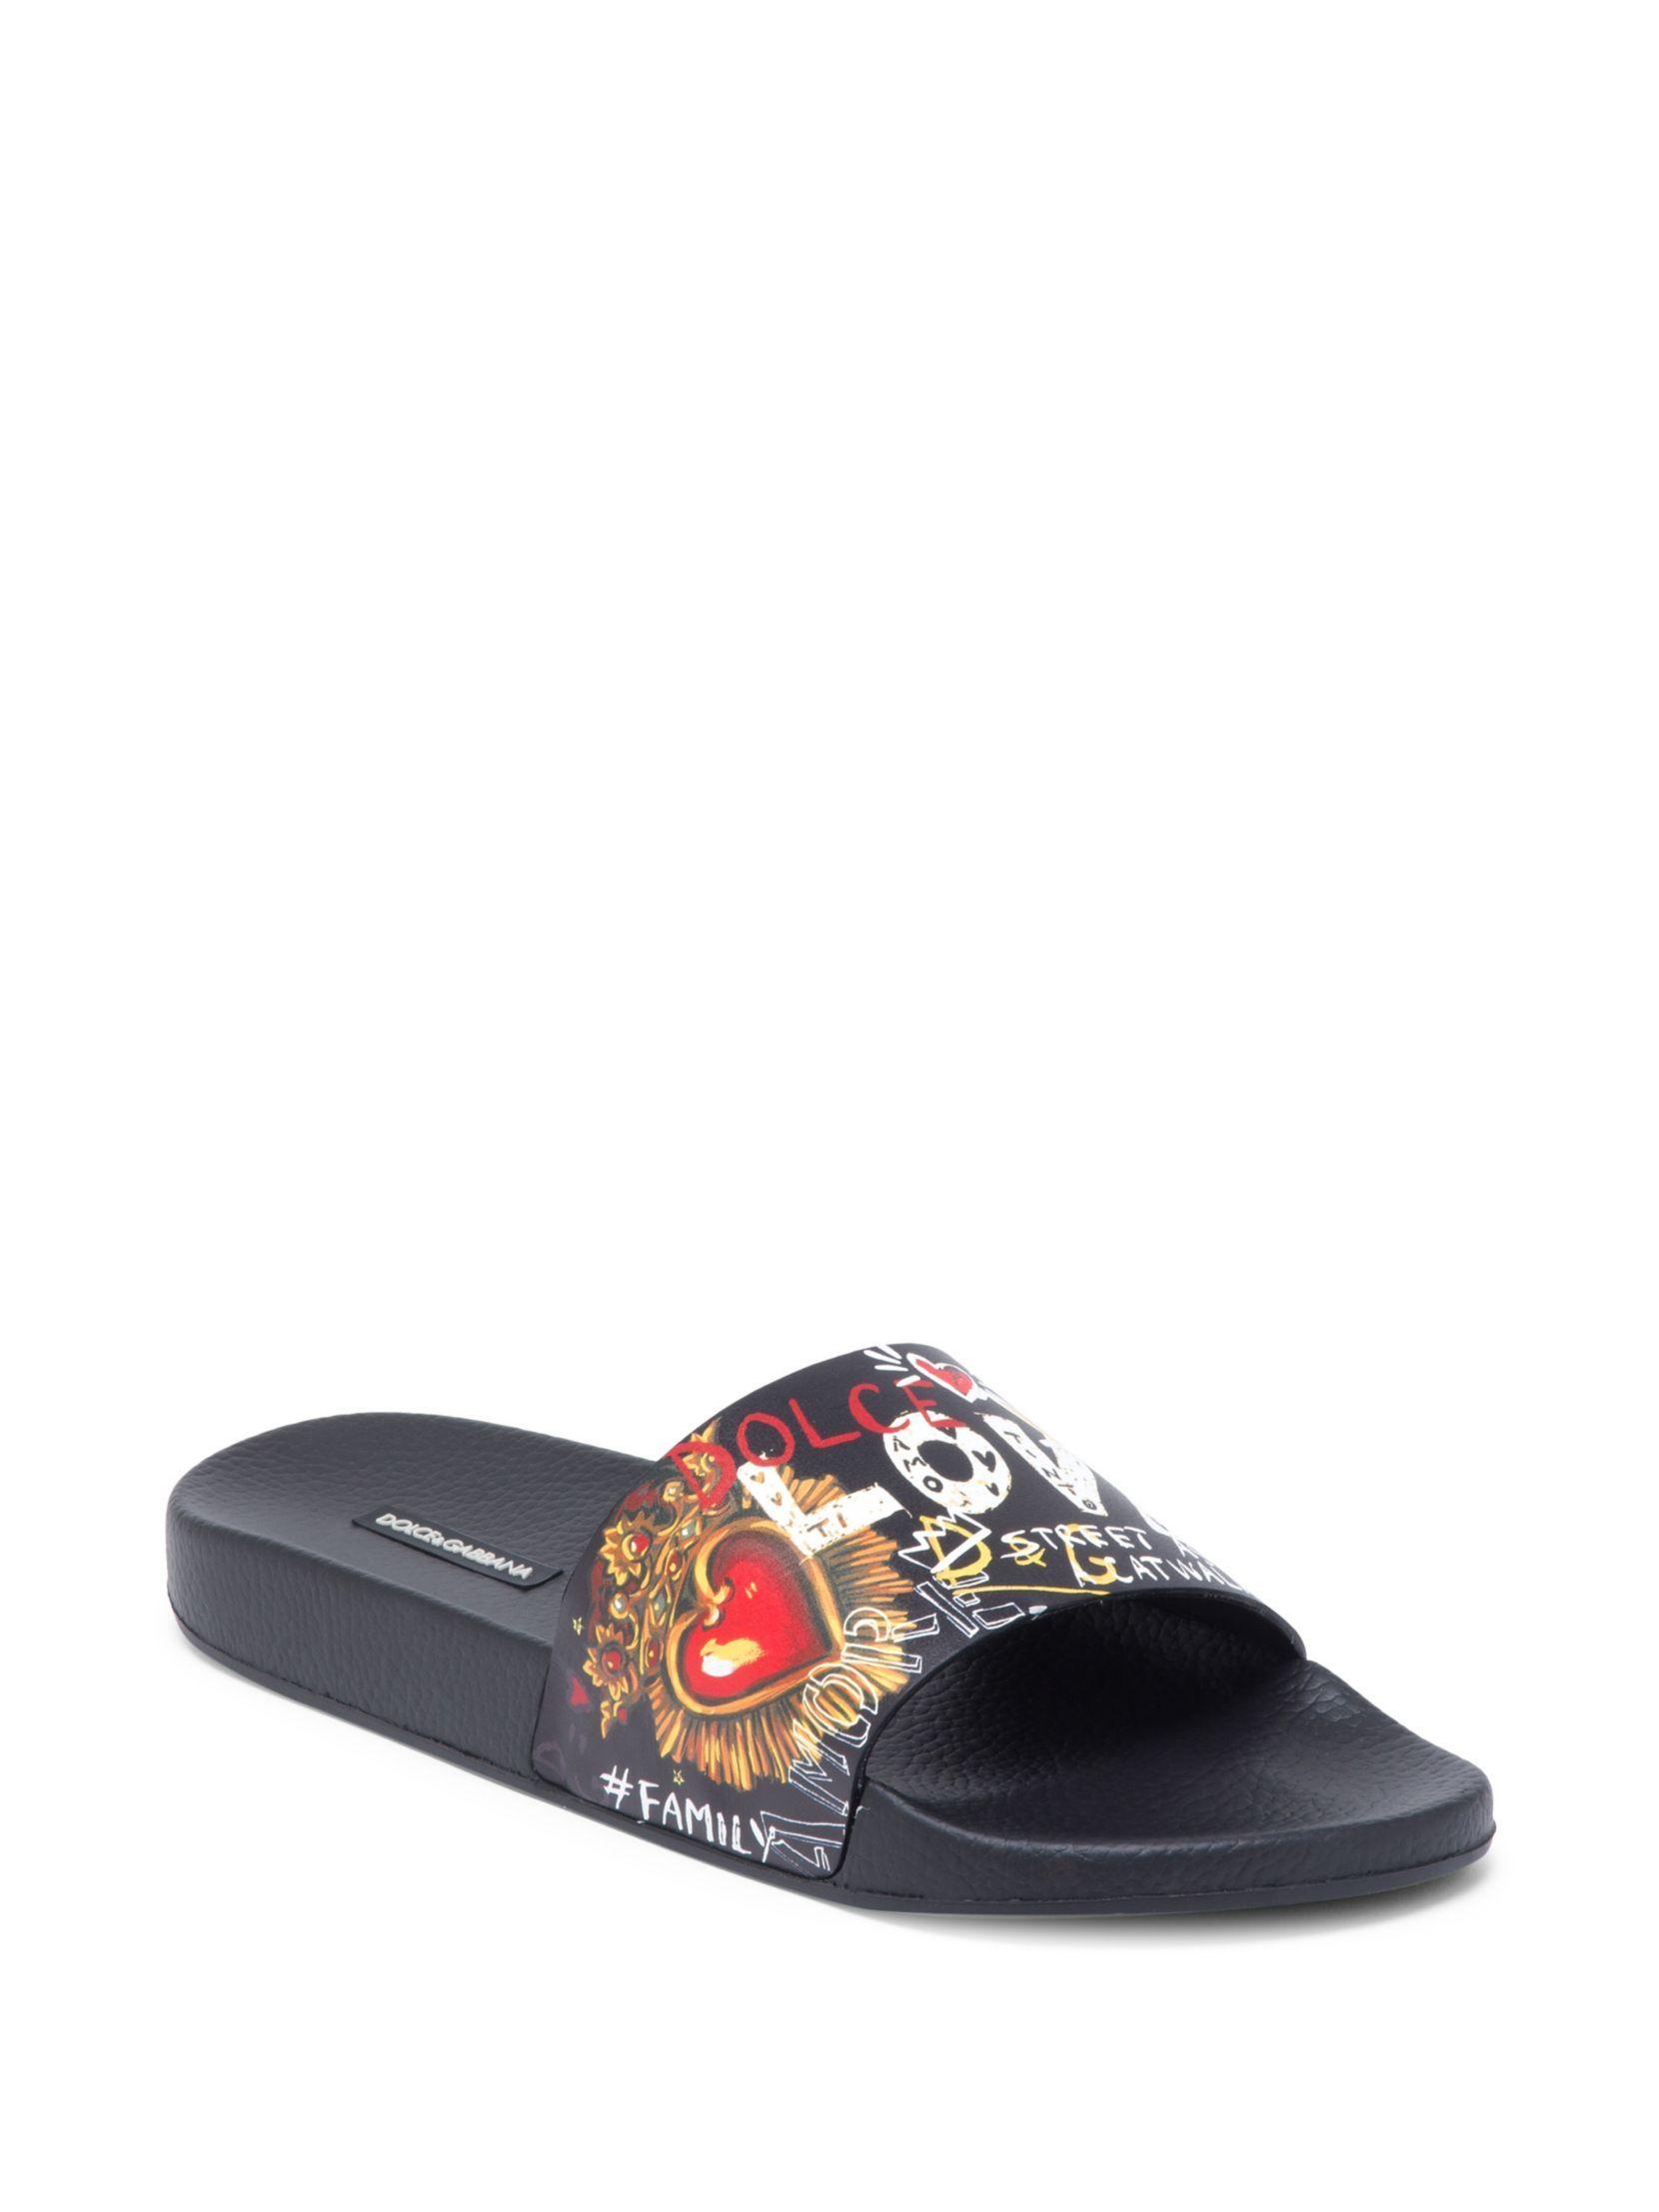 Dolce & Gabbana Artwork Leather Slides KX1taAEl5